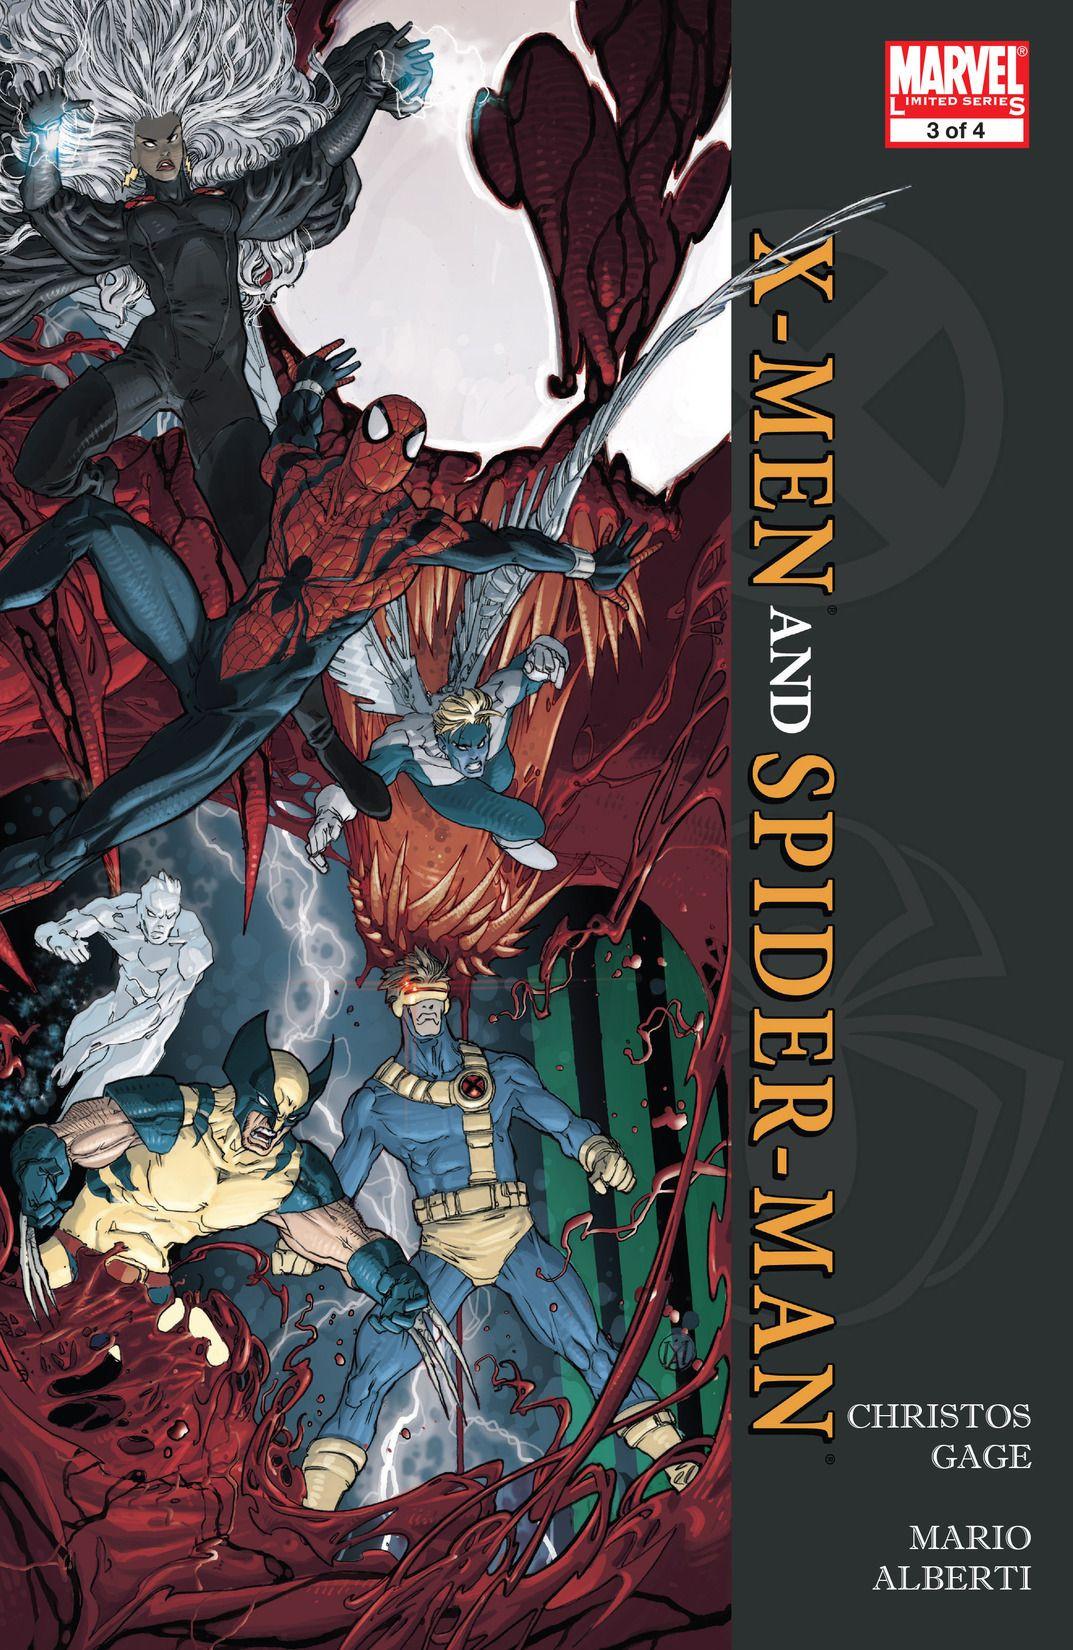 X-Men / Spider-Man Vol 1 3